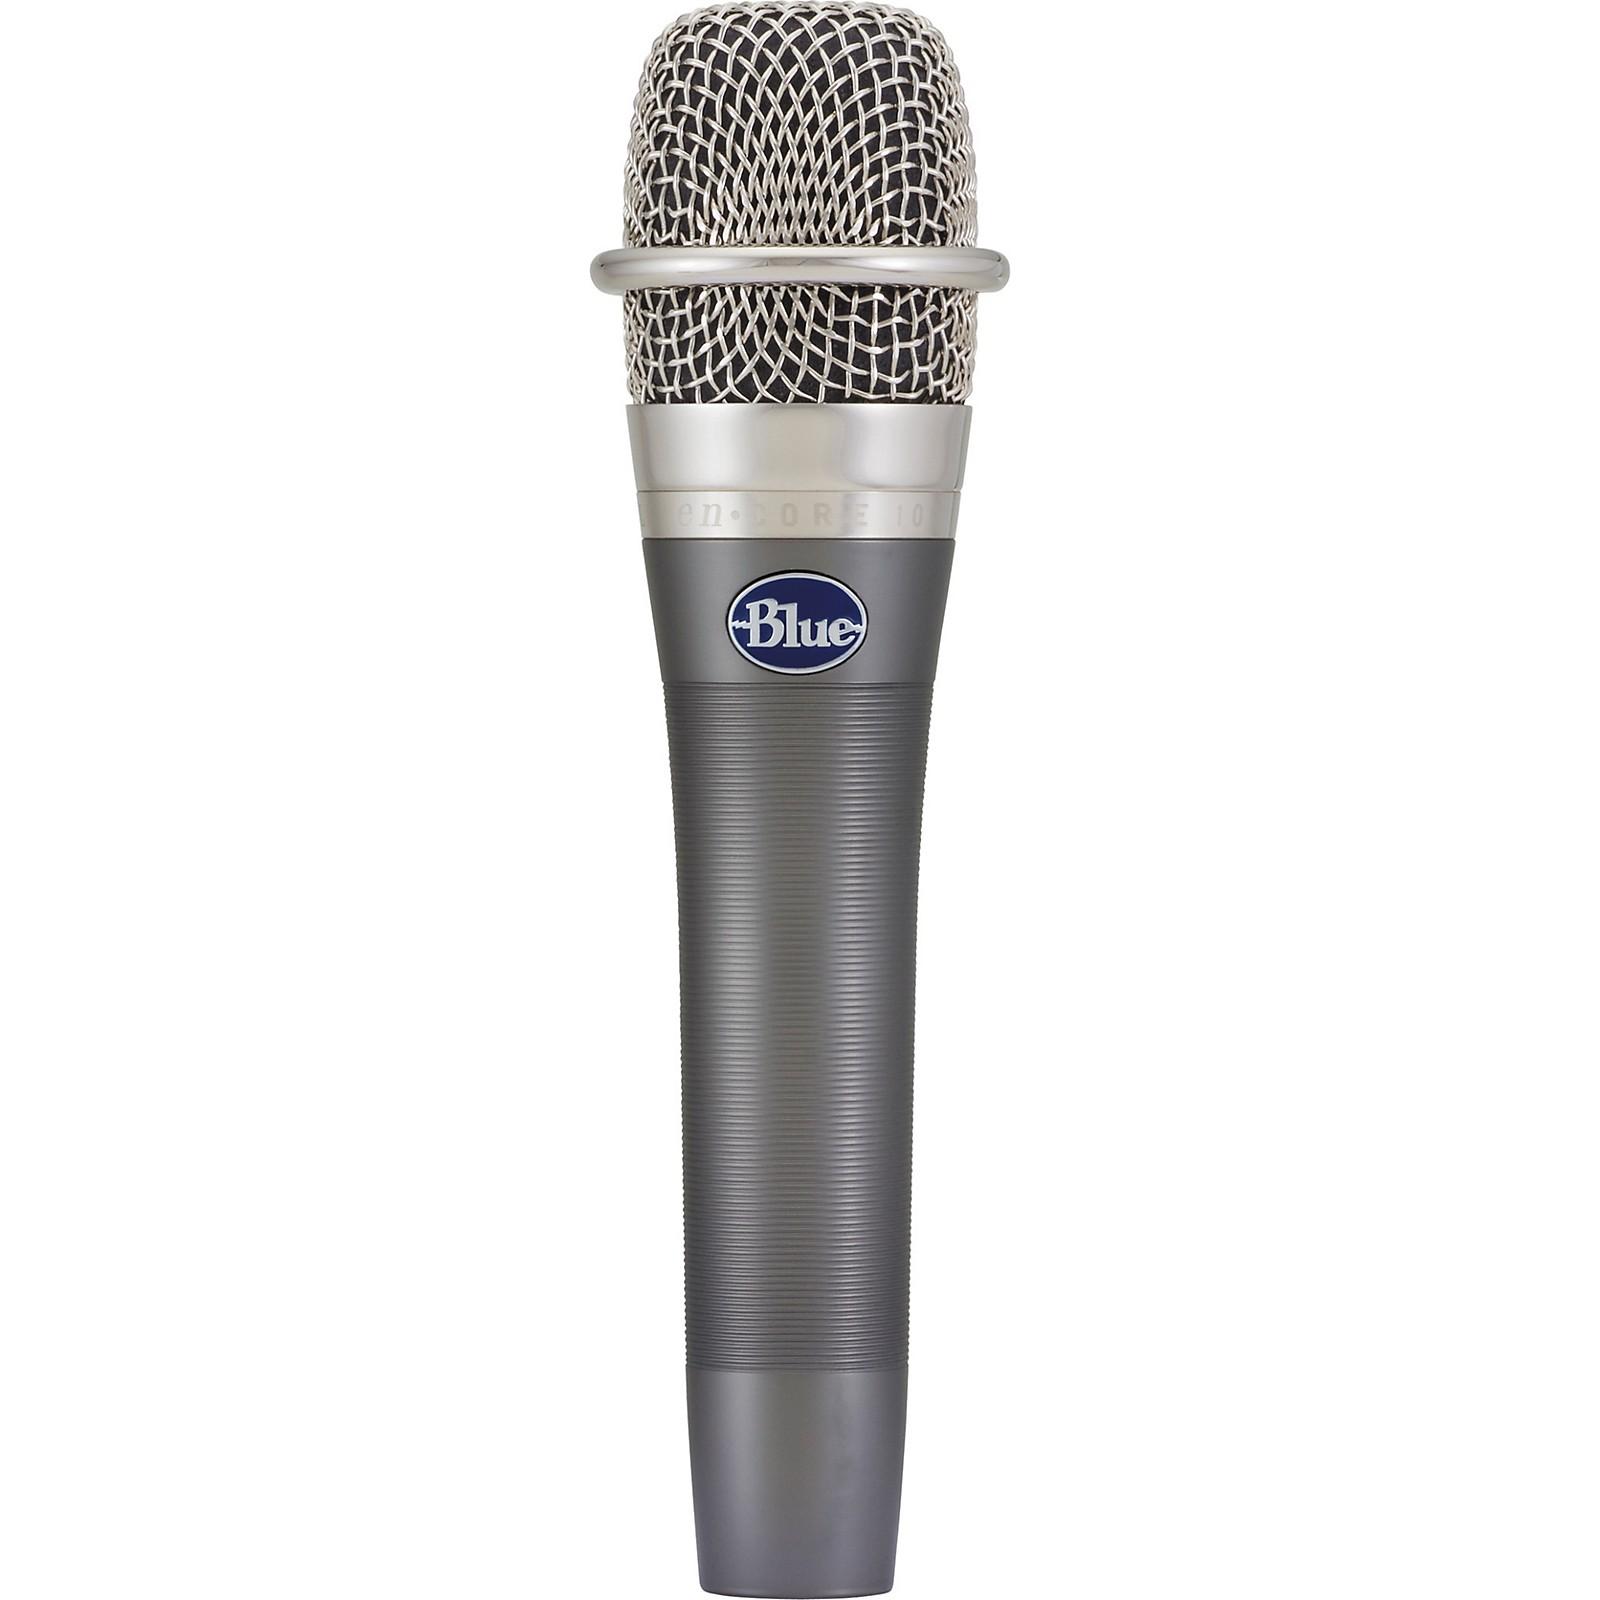 BLUE enCORE 100 Dynamic Vocal Microphone